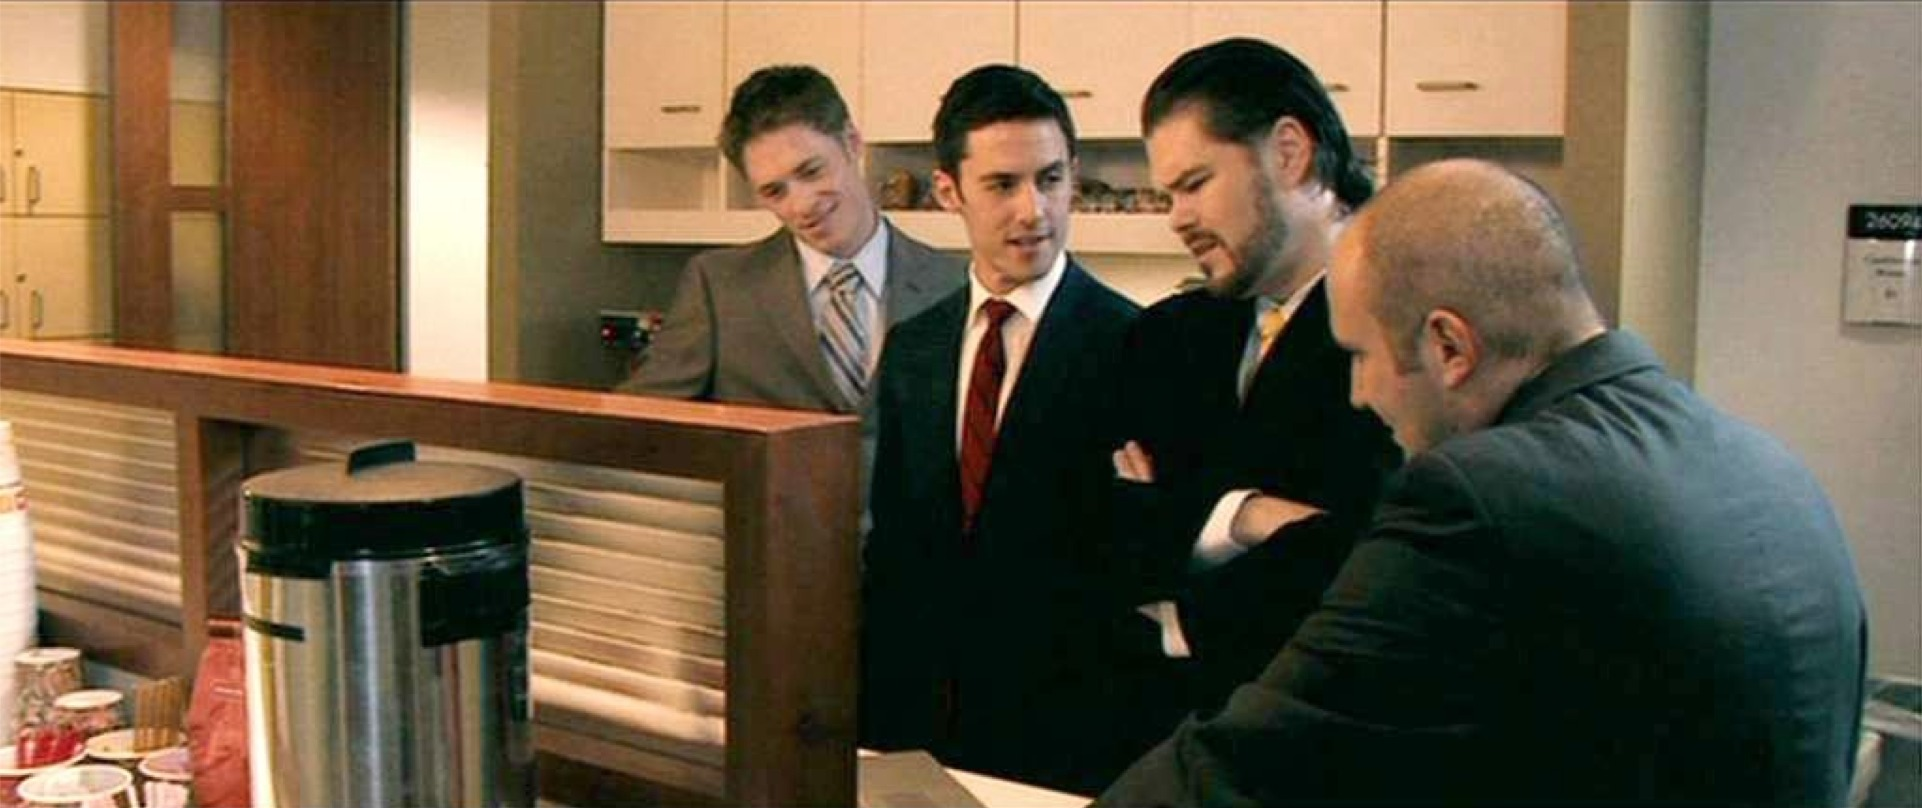 Ryan Daniel Dobson, Milo Ventimiglia Chip Joslin and Michael Kass from Order of Chaos.